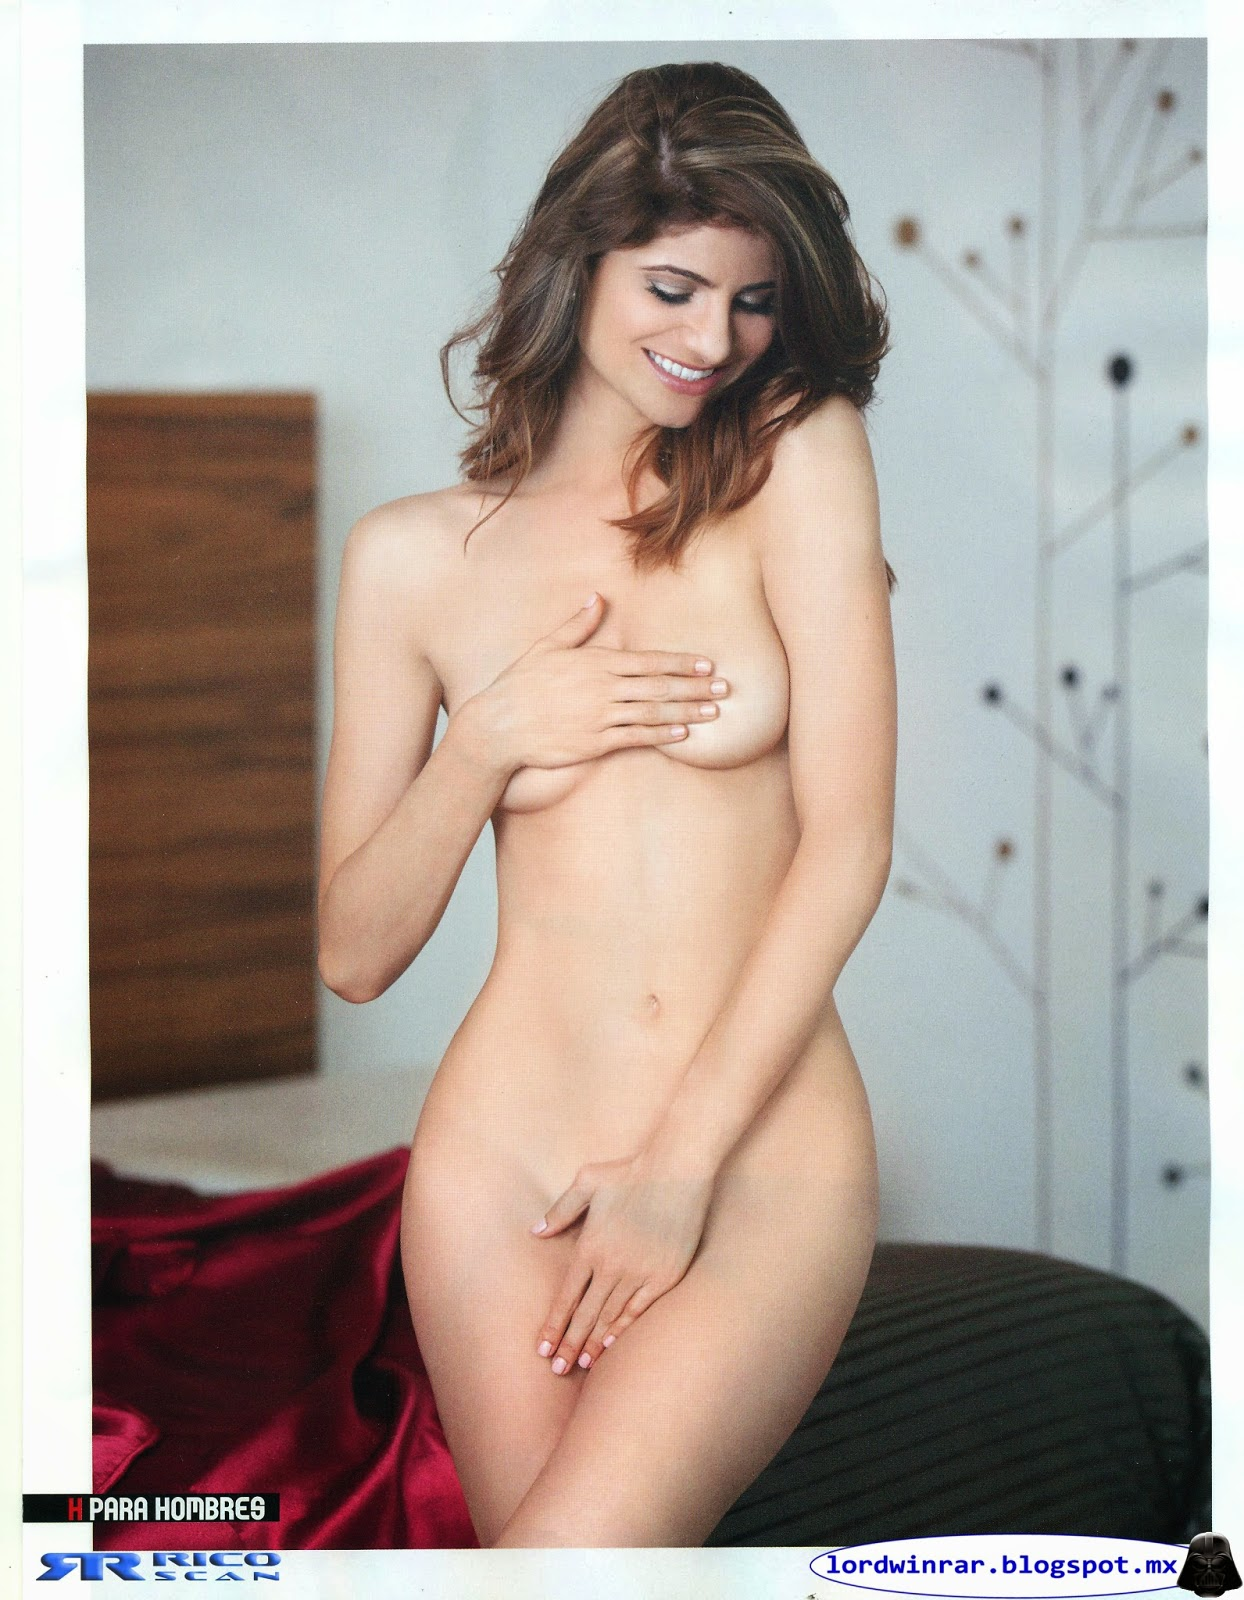 maria aura   h para hombres 2015 enero 35 fotos hq